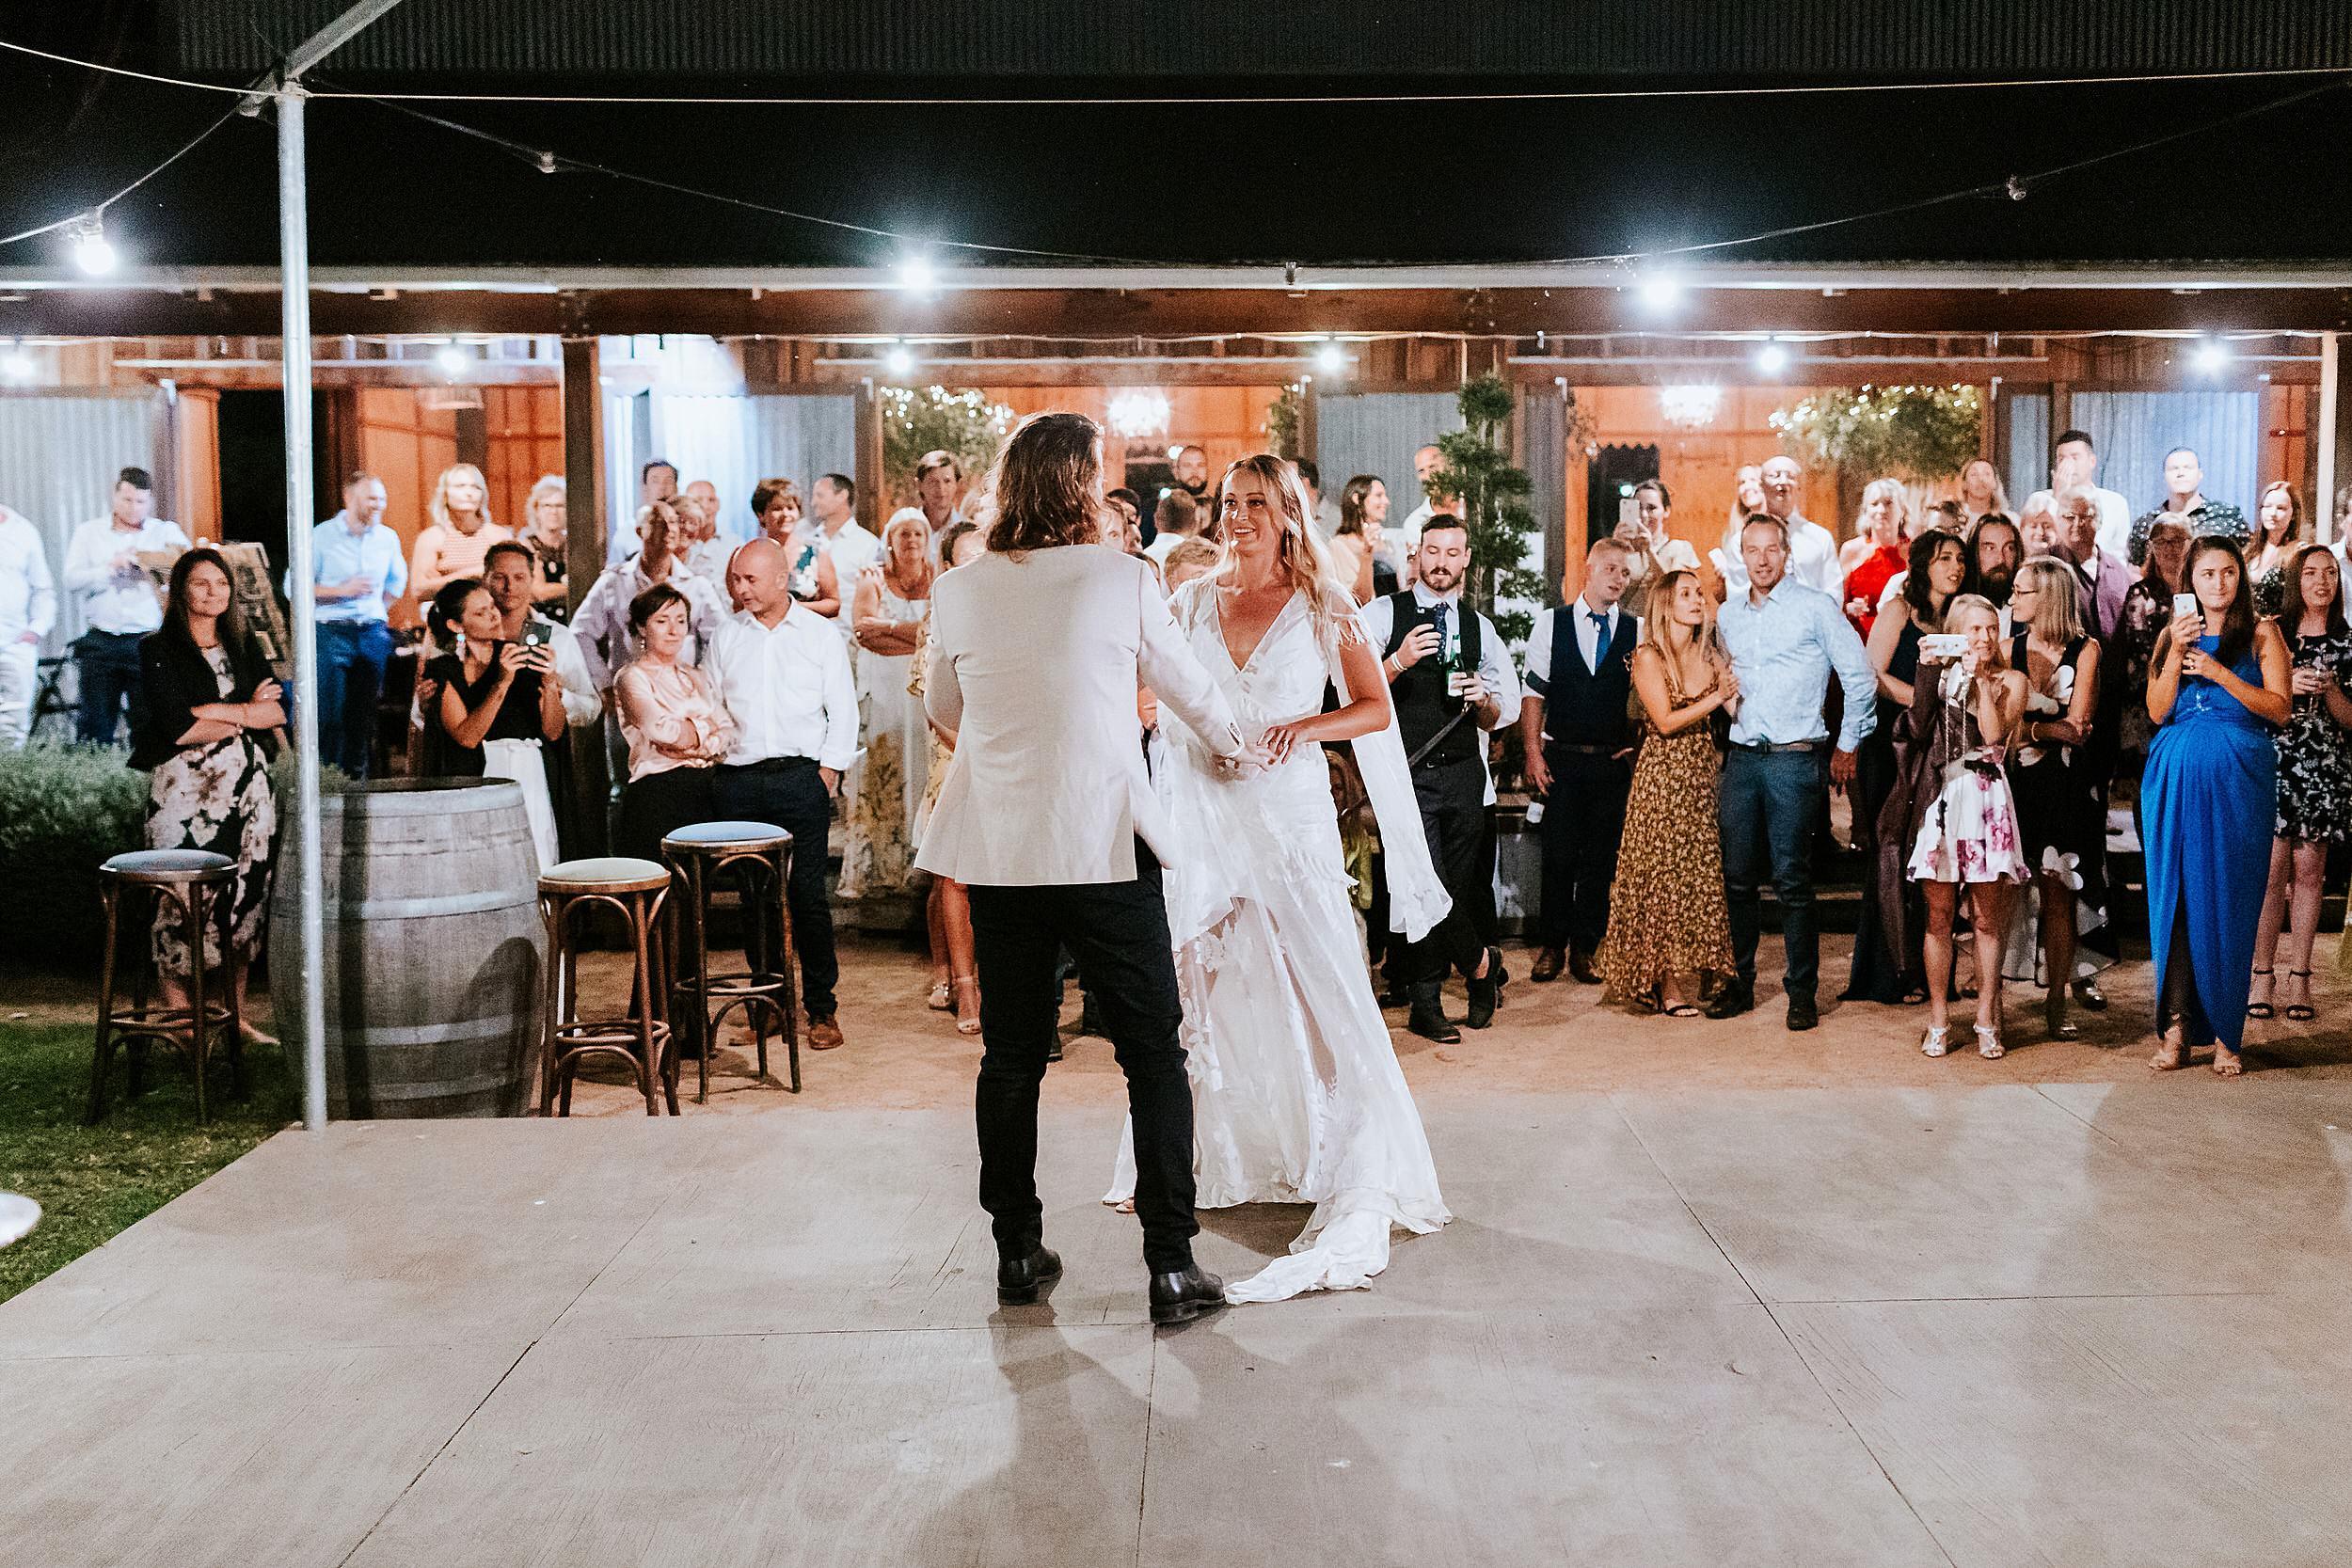 wedding_the_woolshed_steph_zac_0201.jpg